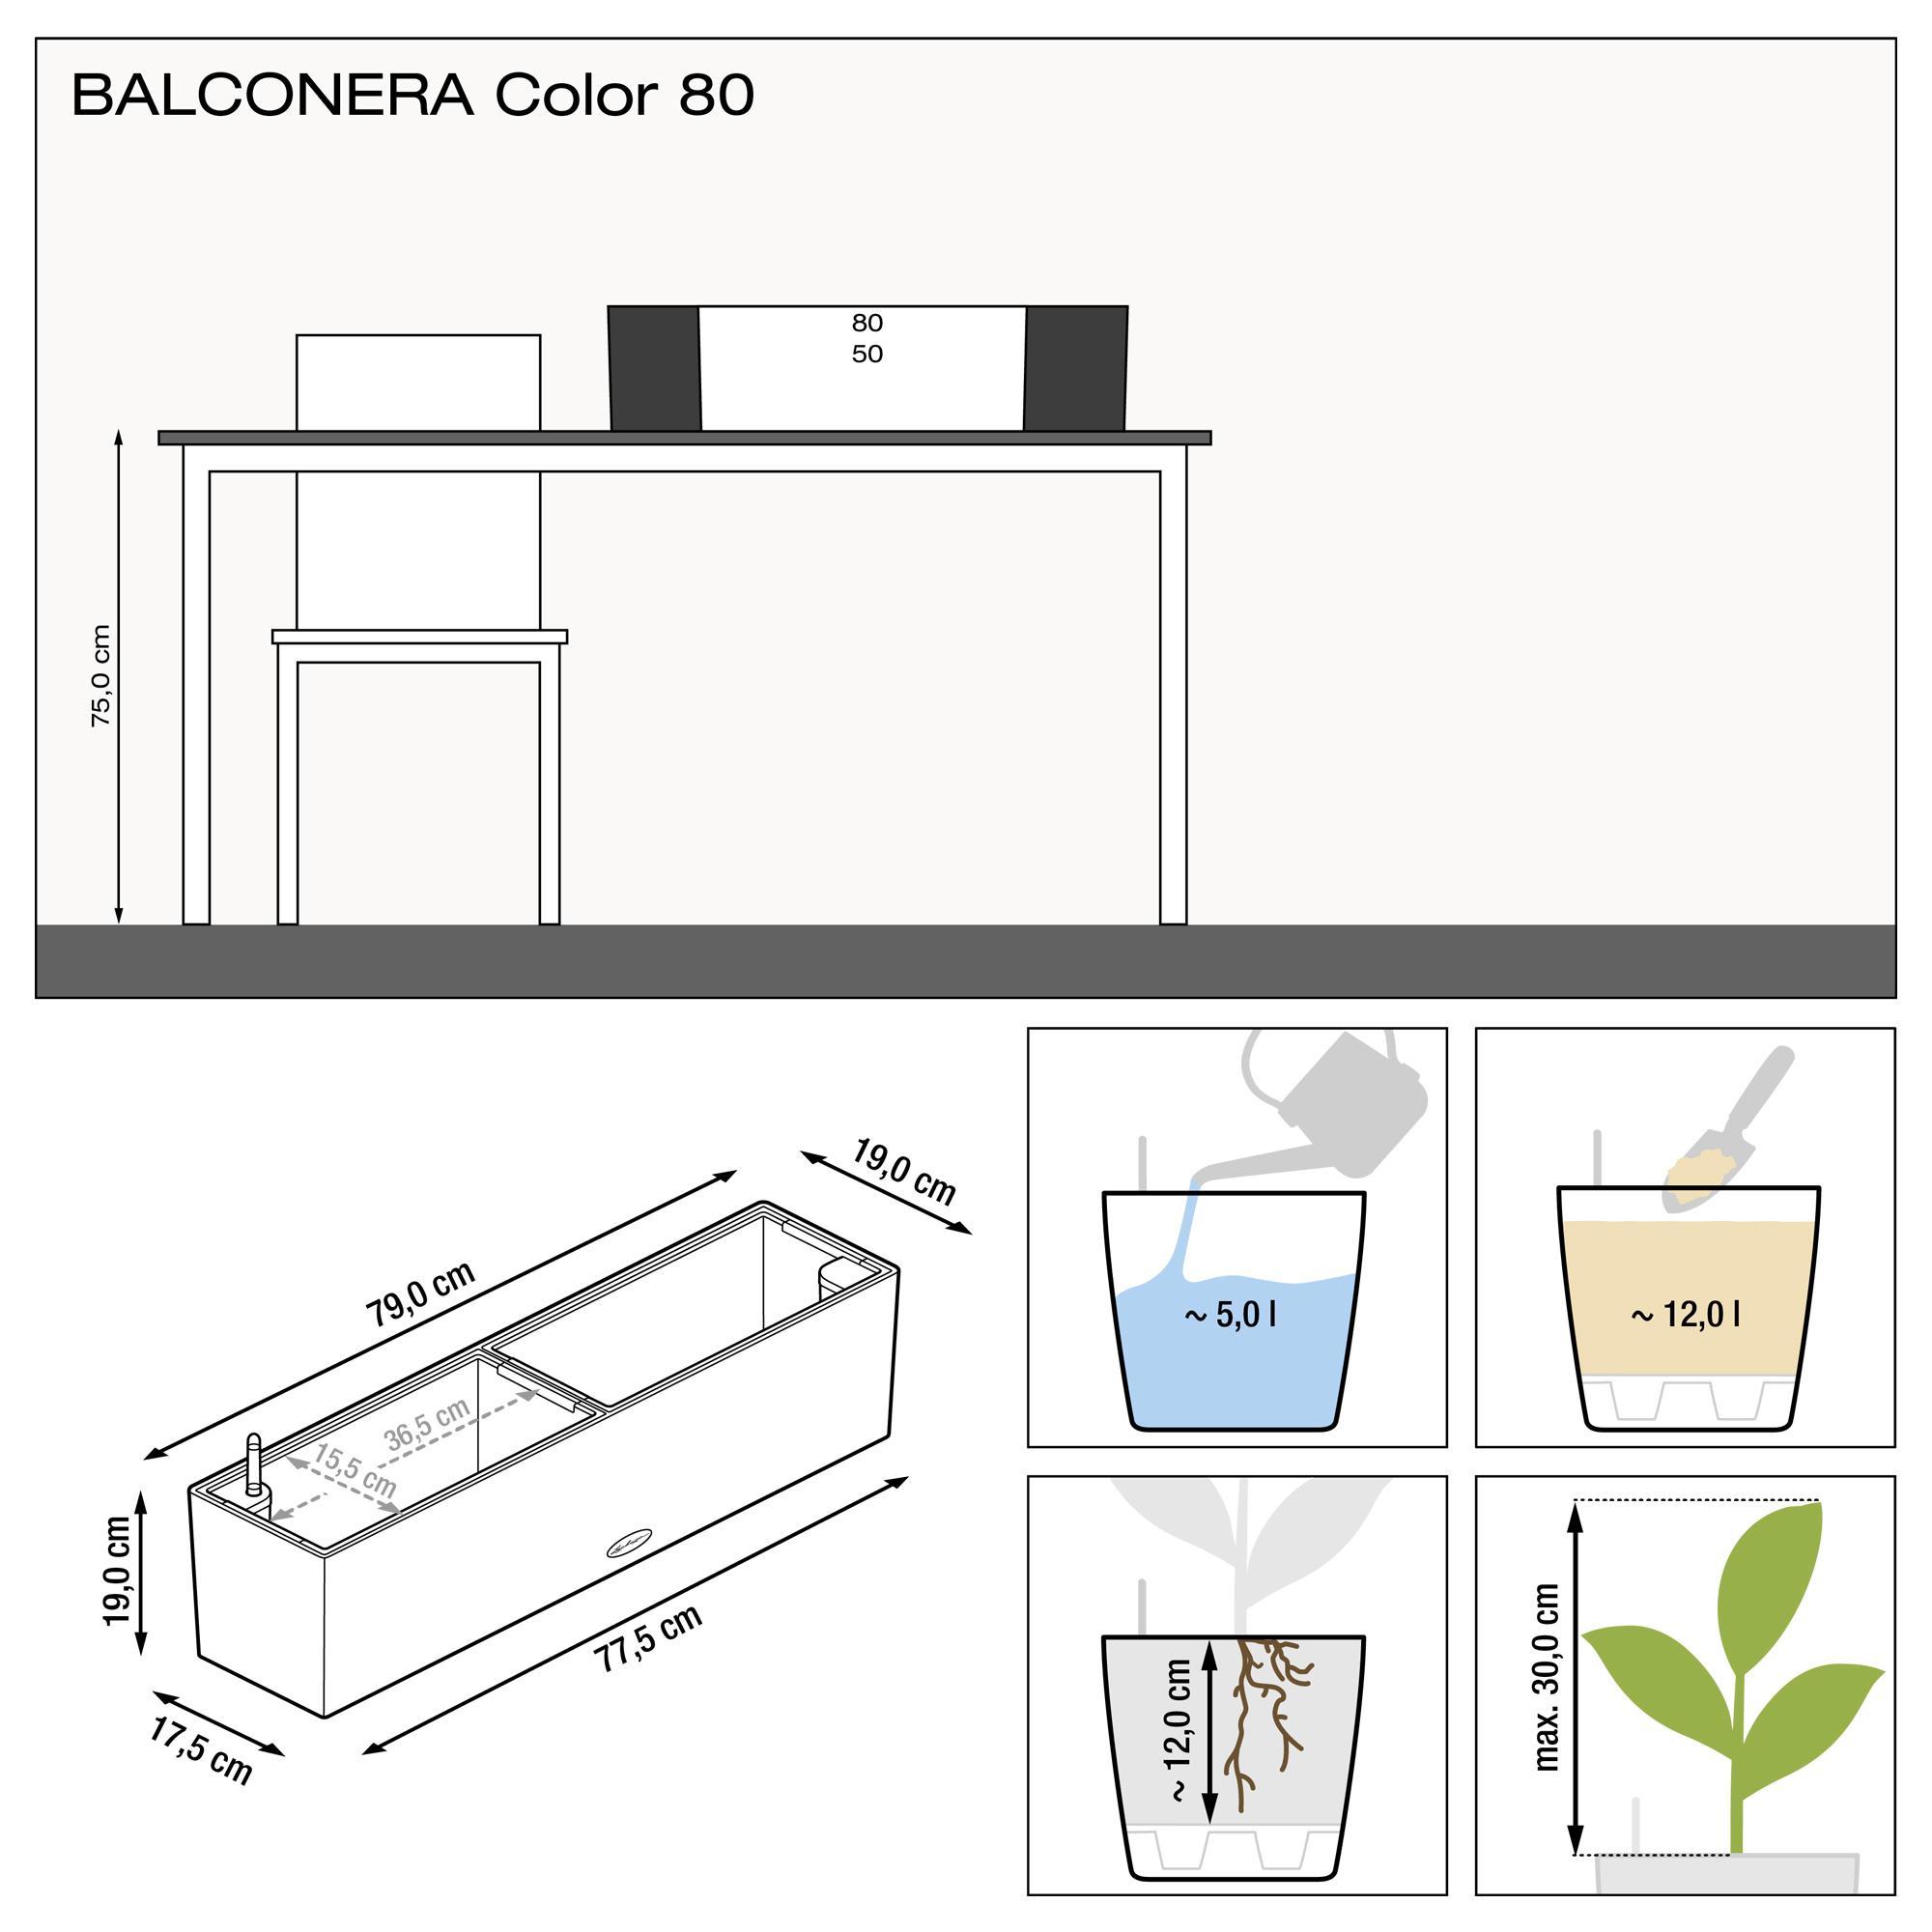 BALCONERA Color 80 slate - Image 3